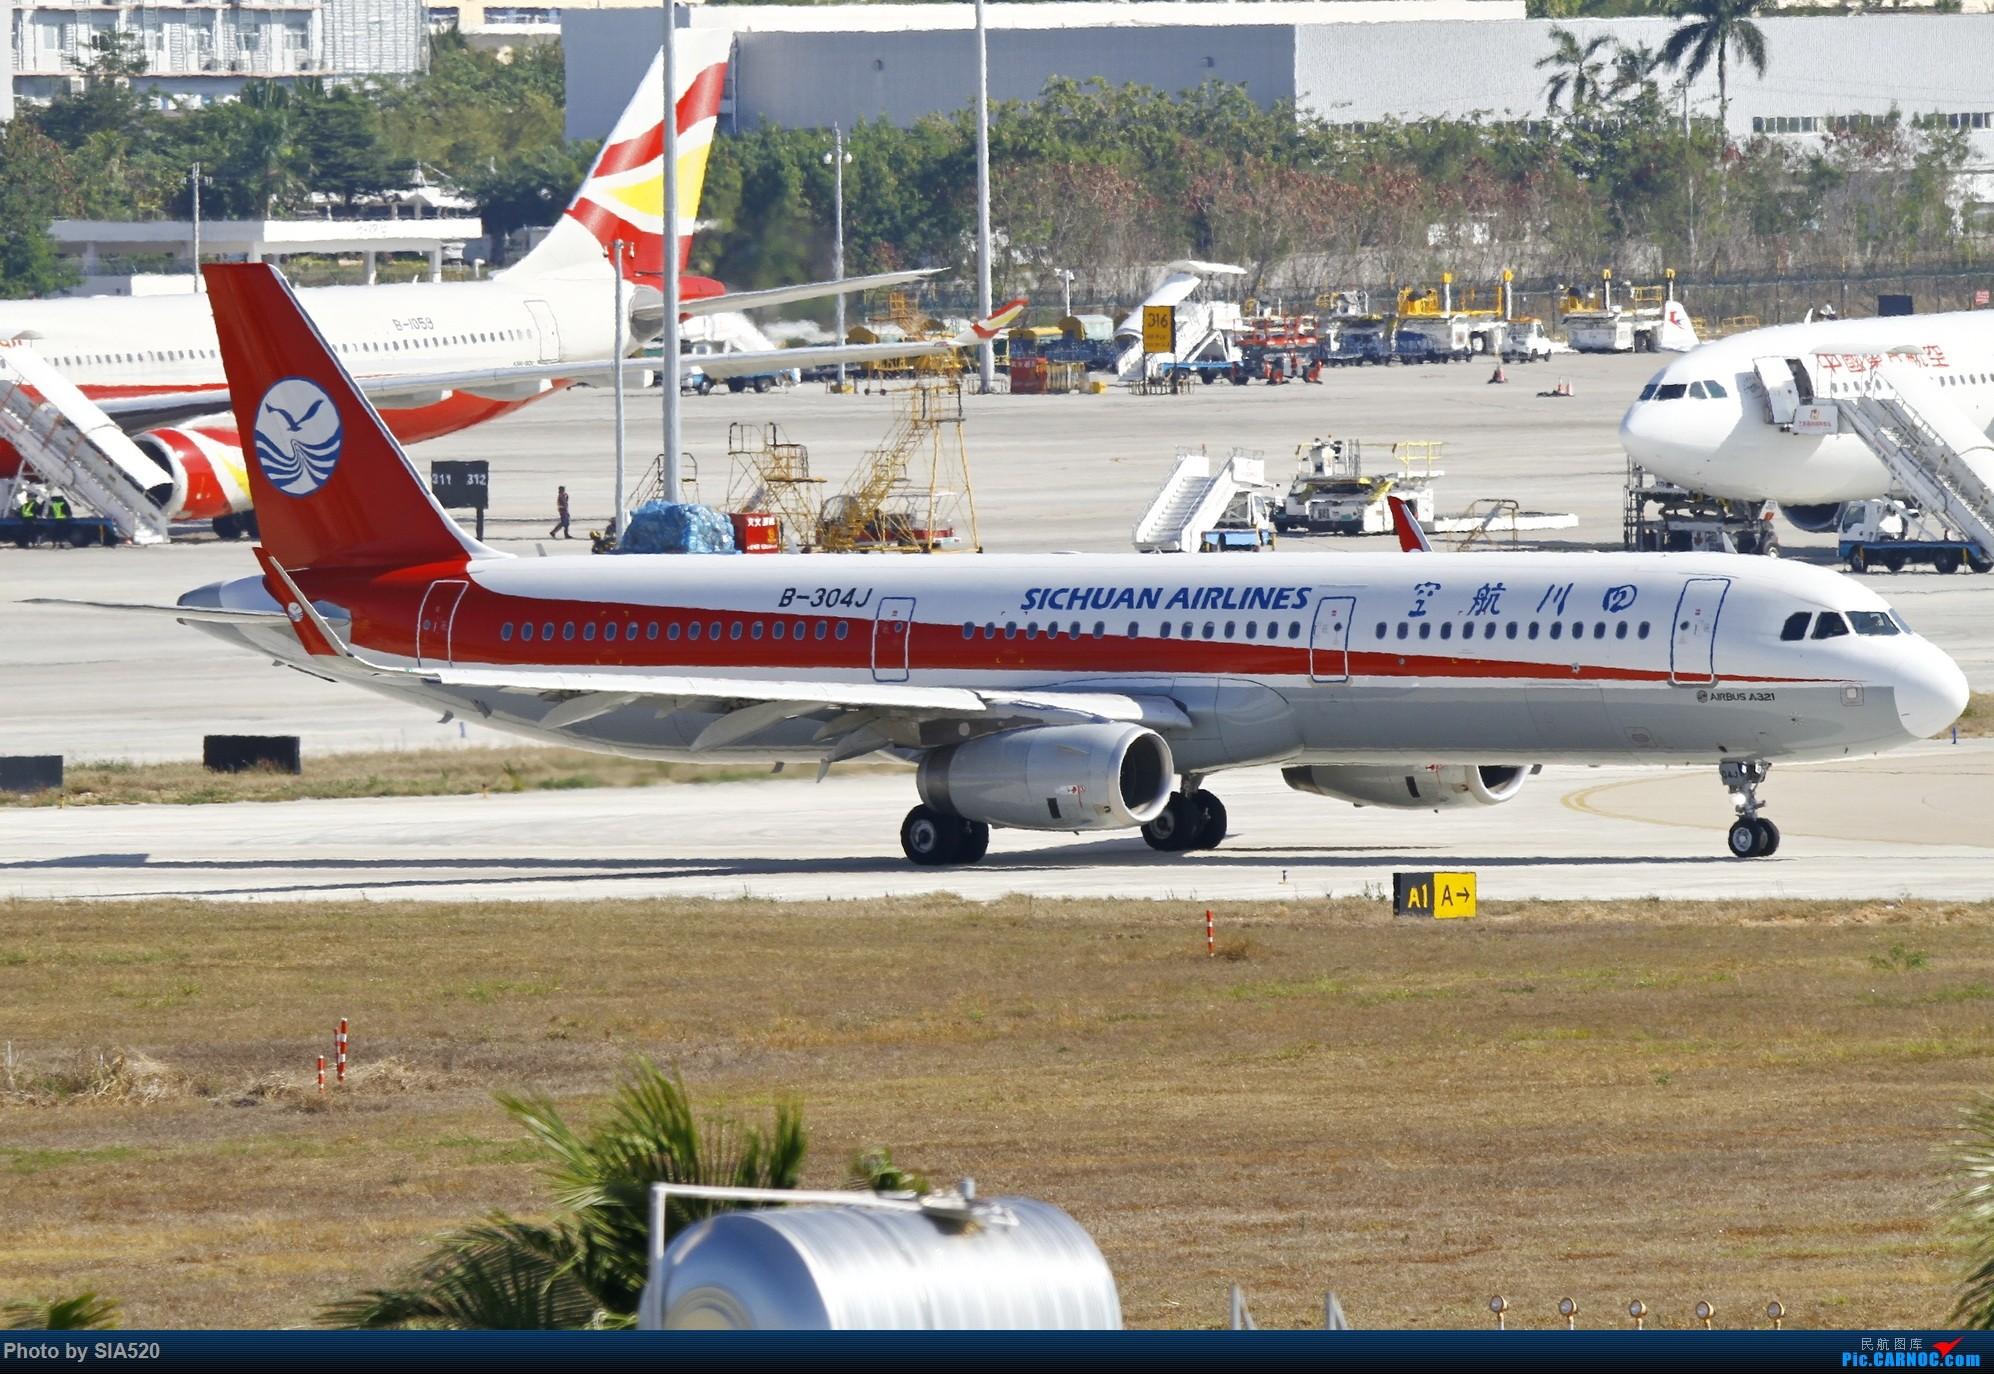 Re:[原创]北京人儿在三亚—600mm解锁凤凰 AIRBUS A321-200 B-304J 中国三亚凤凰国际机场